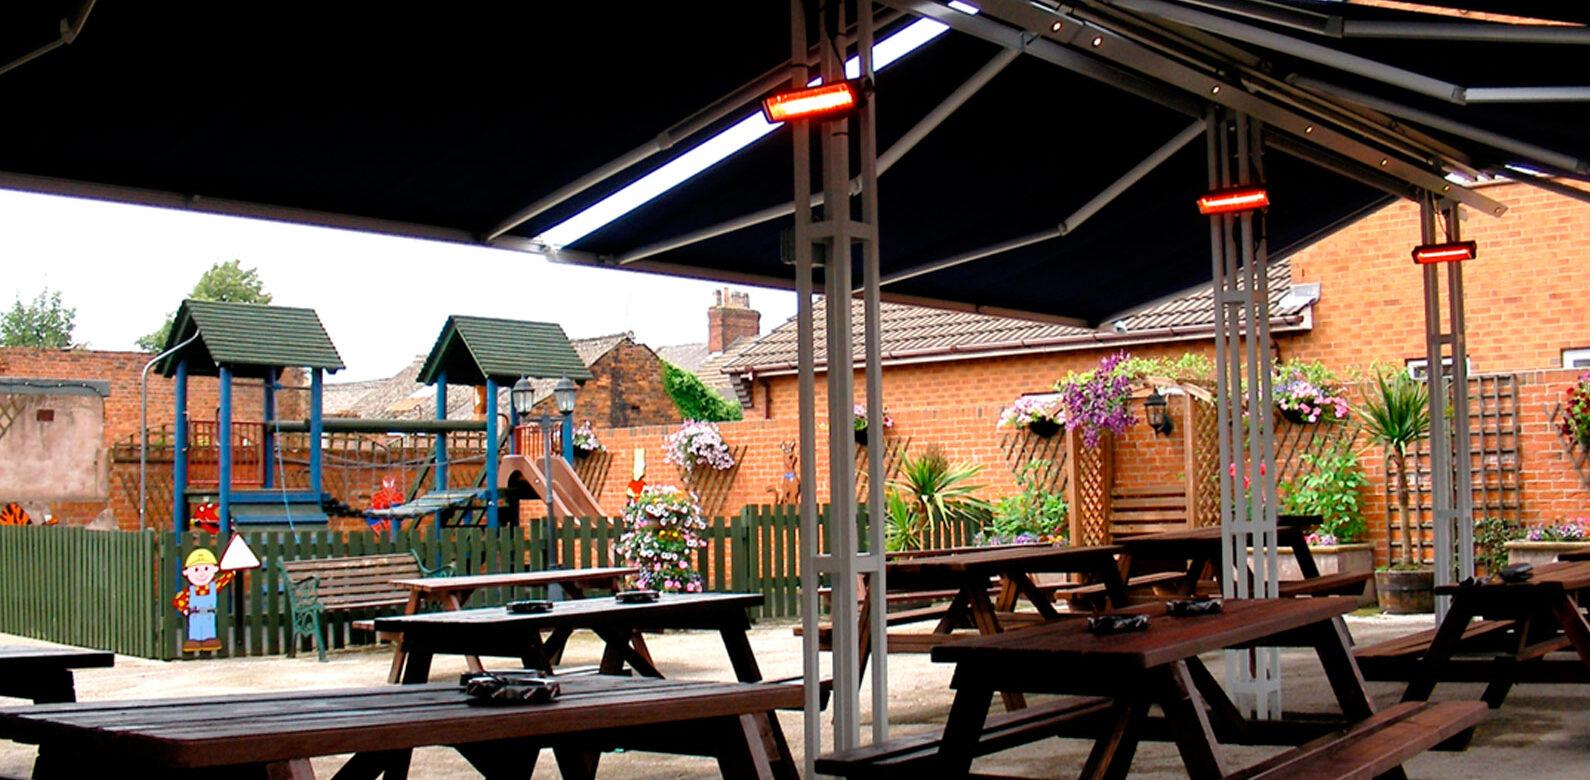 calefaccion-infrarrojos-exterior-terraza-comedor